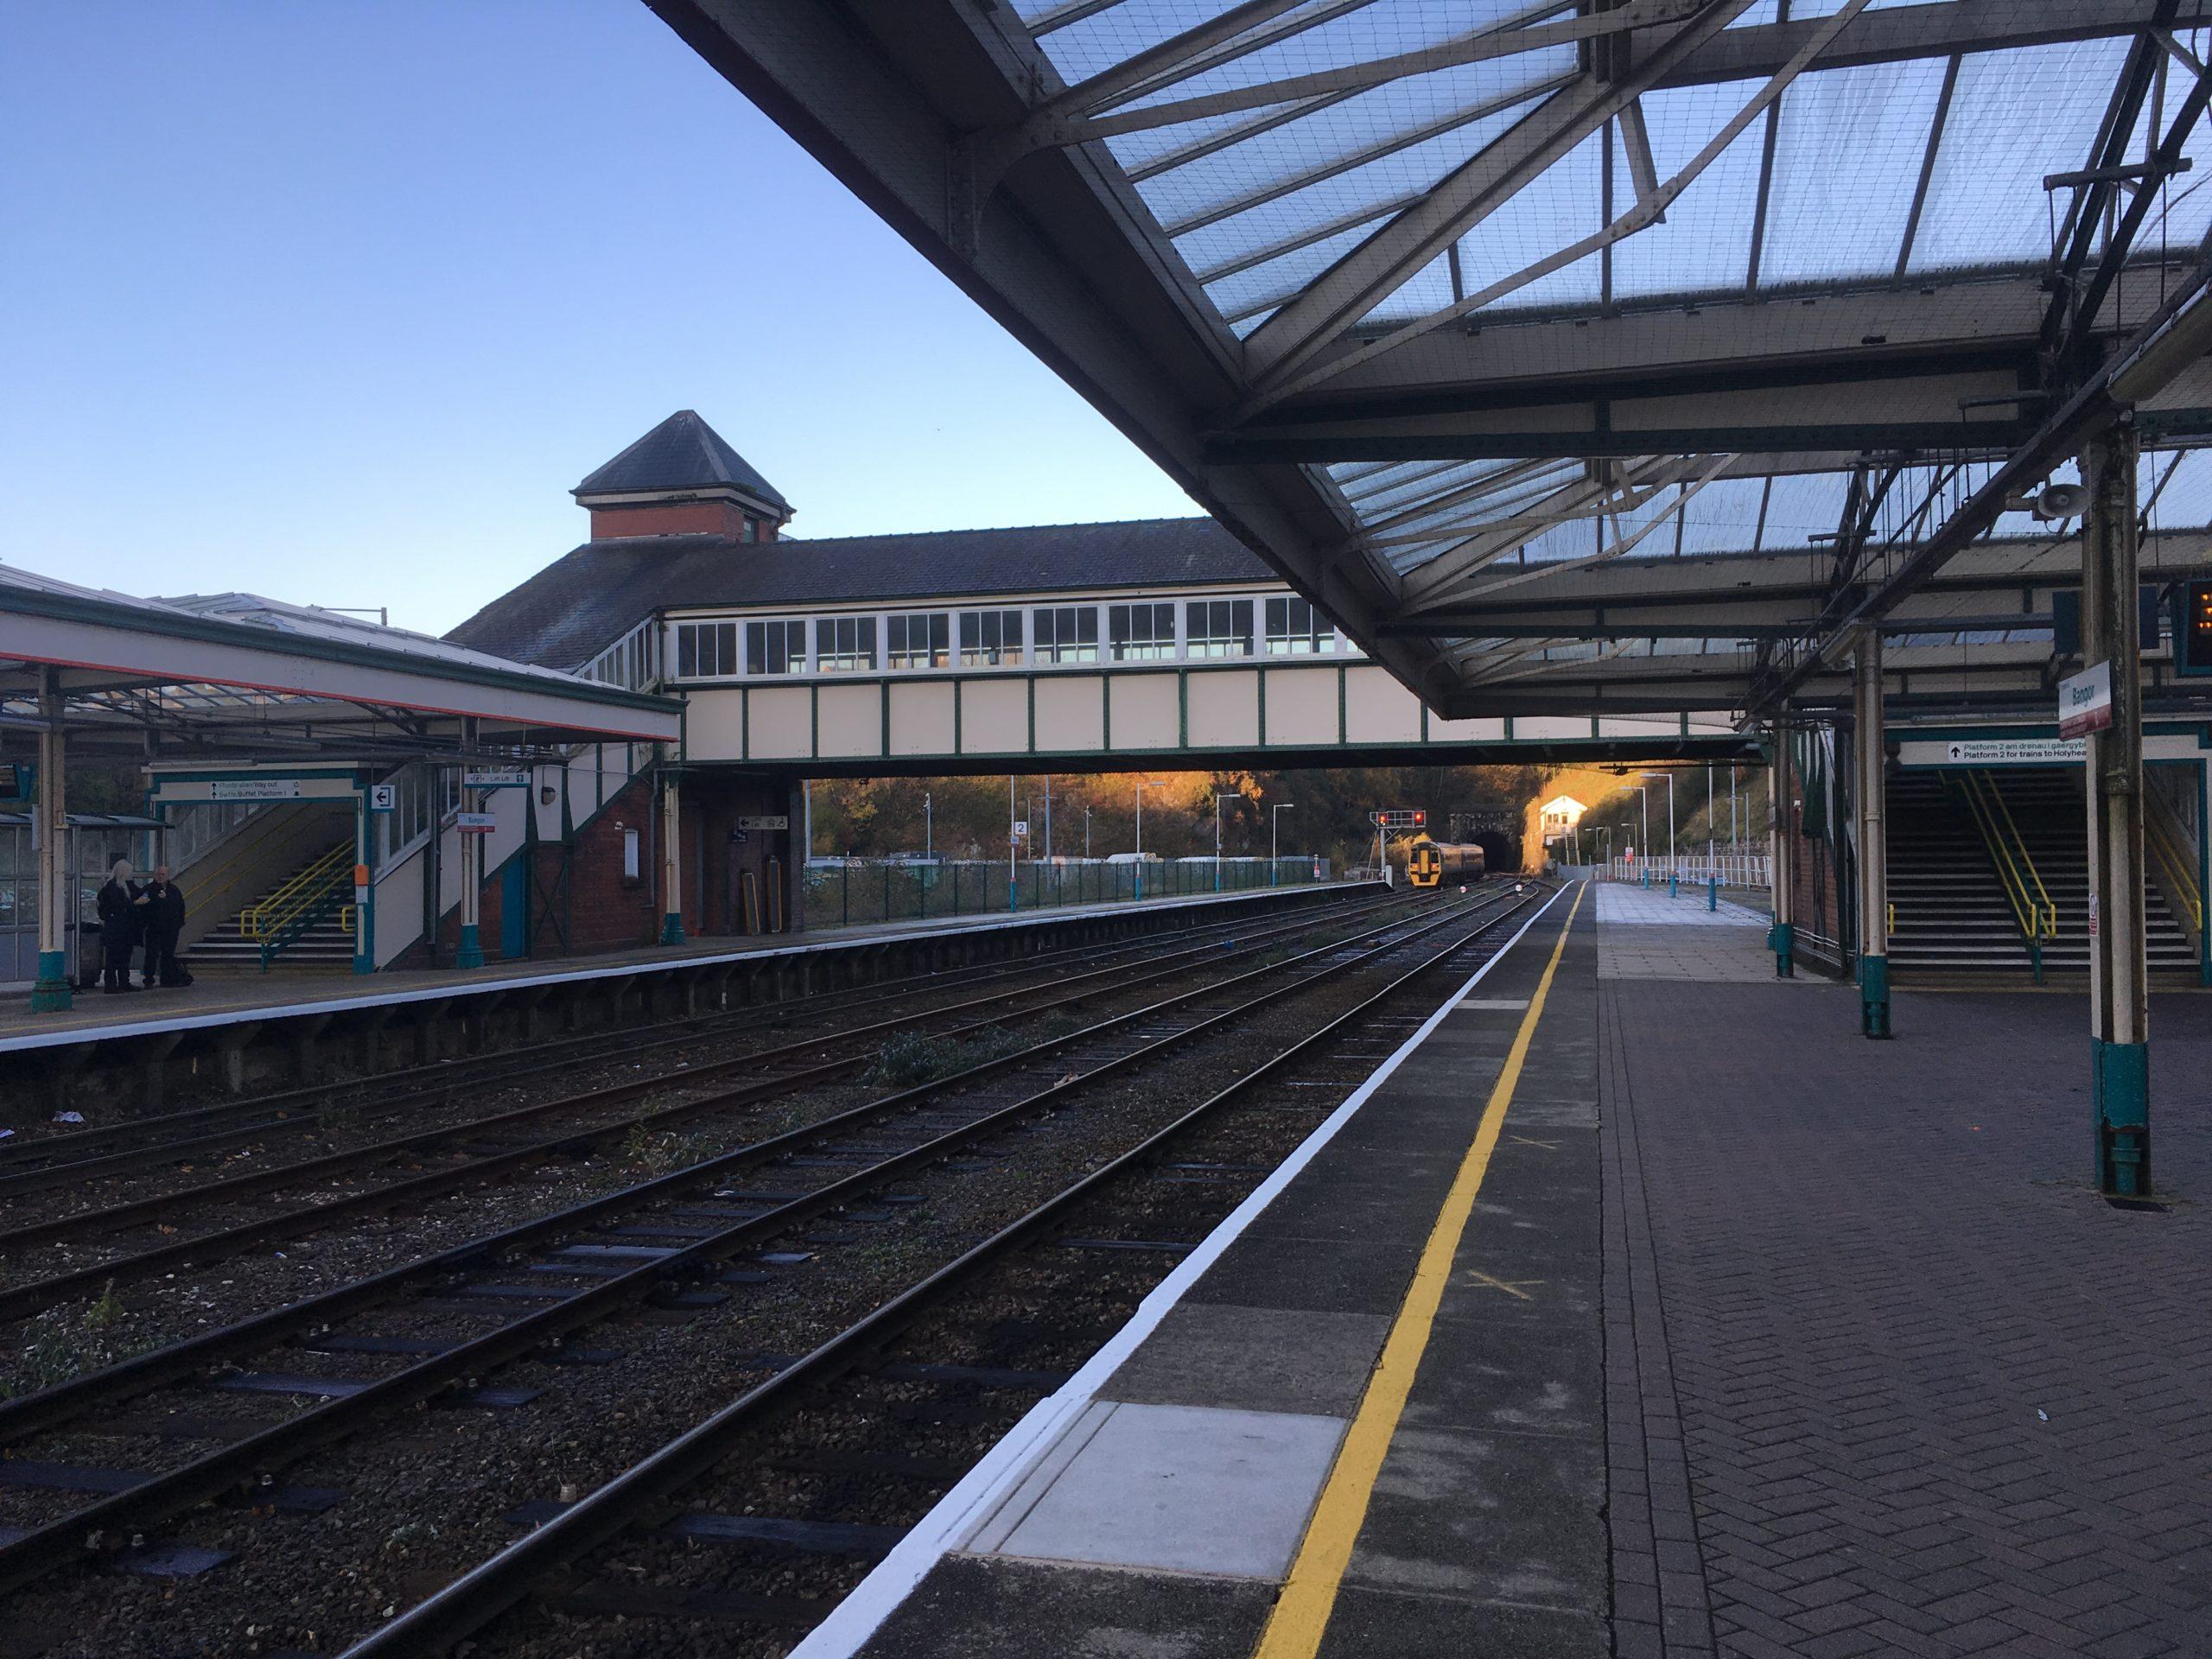 British station